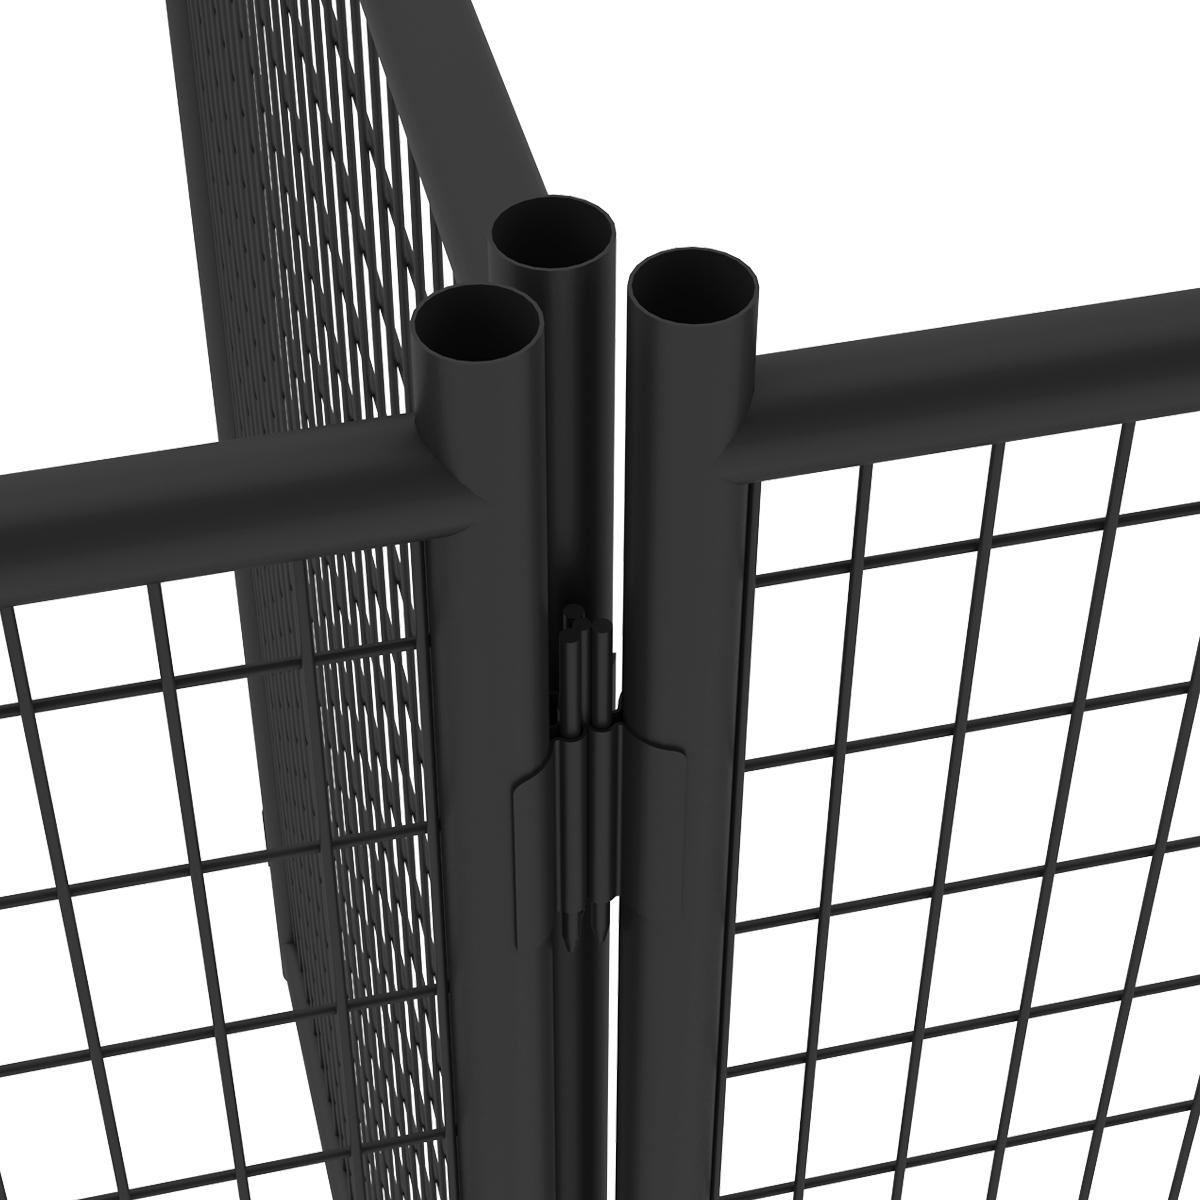 7ft H X 5ft W Pro Duty Steel Premium Kennel Panel Pet